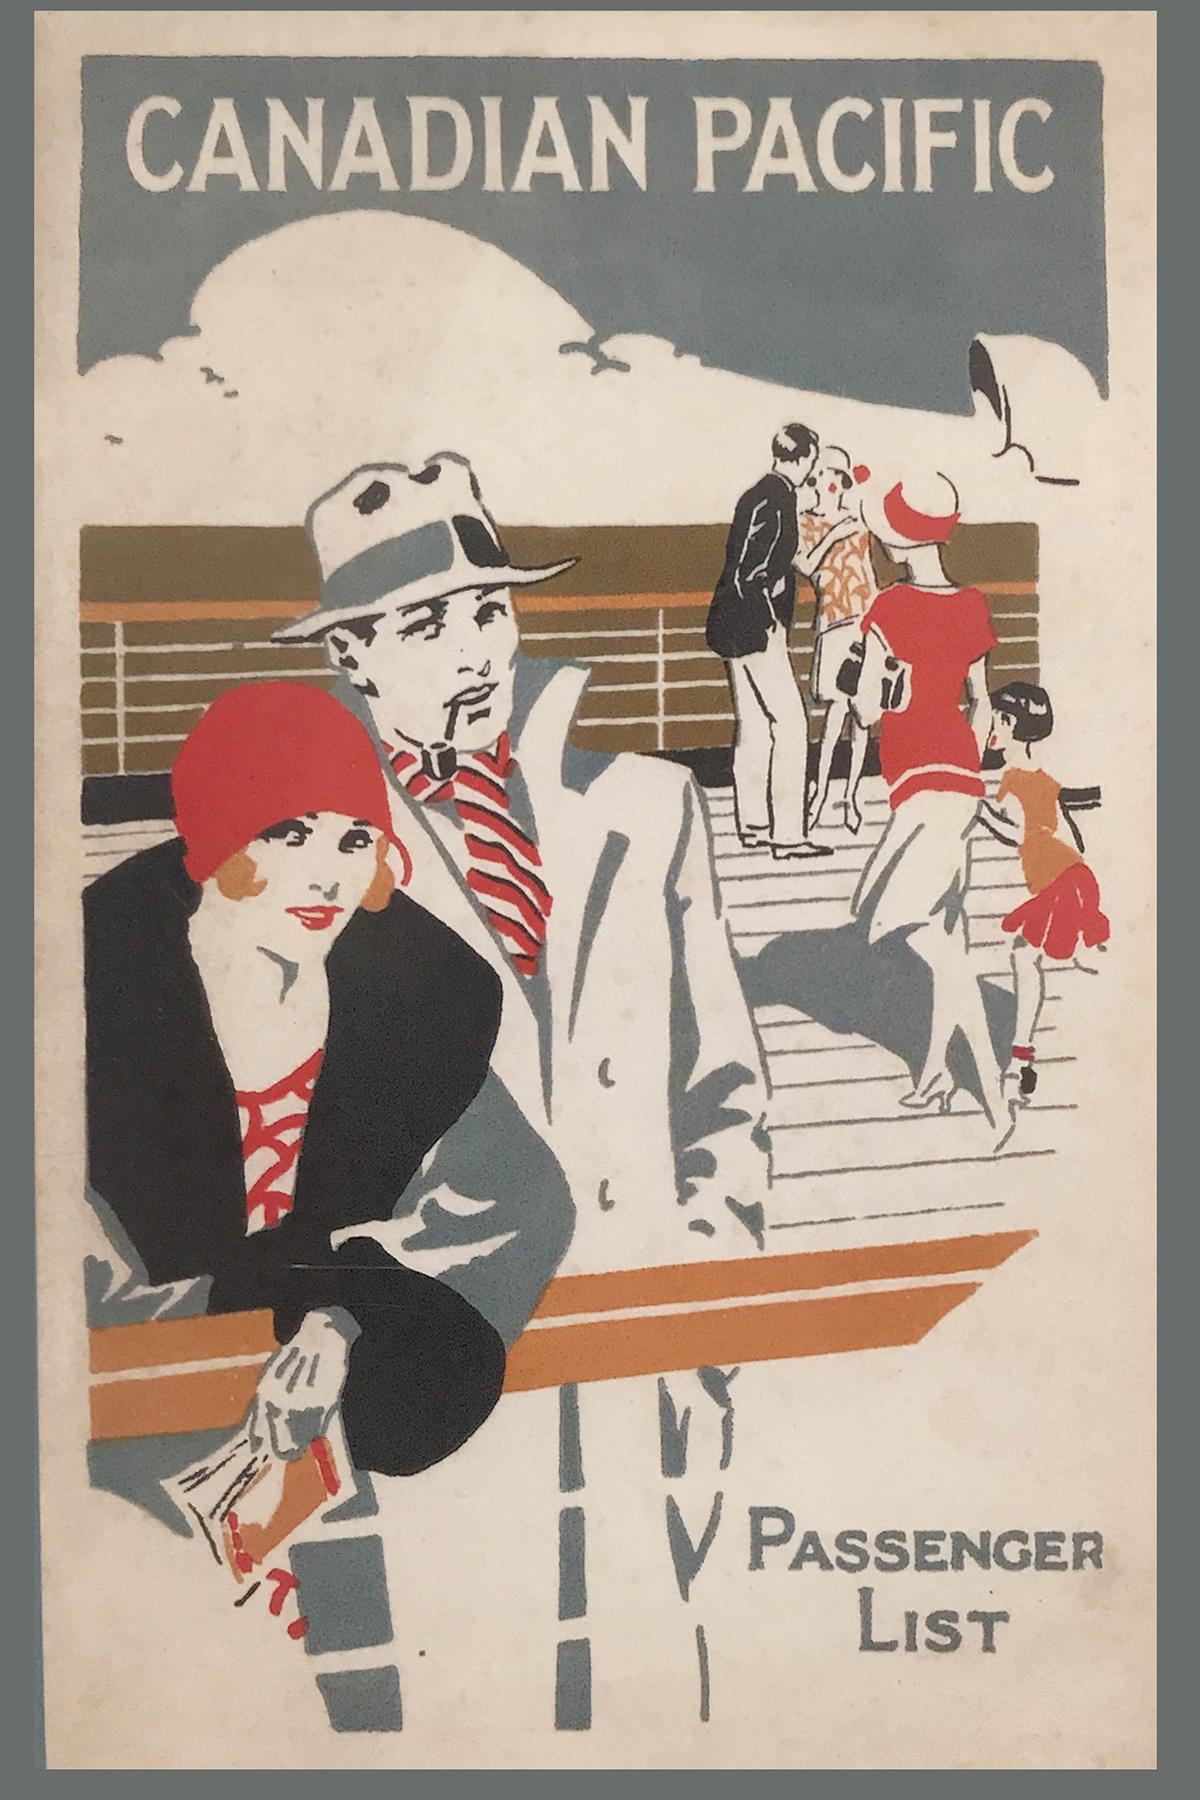 Canadian Pacific passenger list 1929 (booklet) - postcard